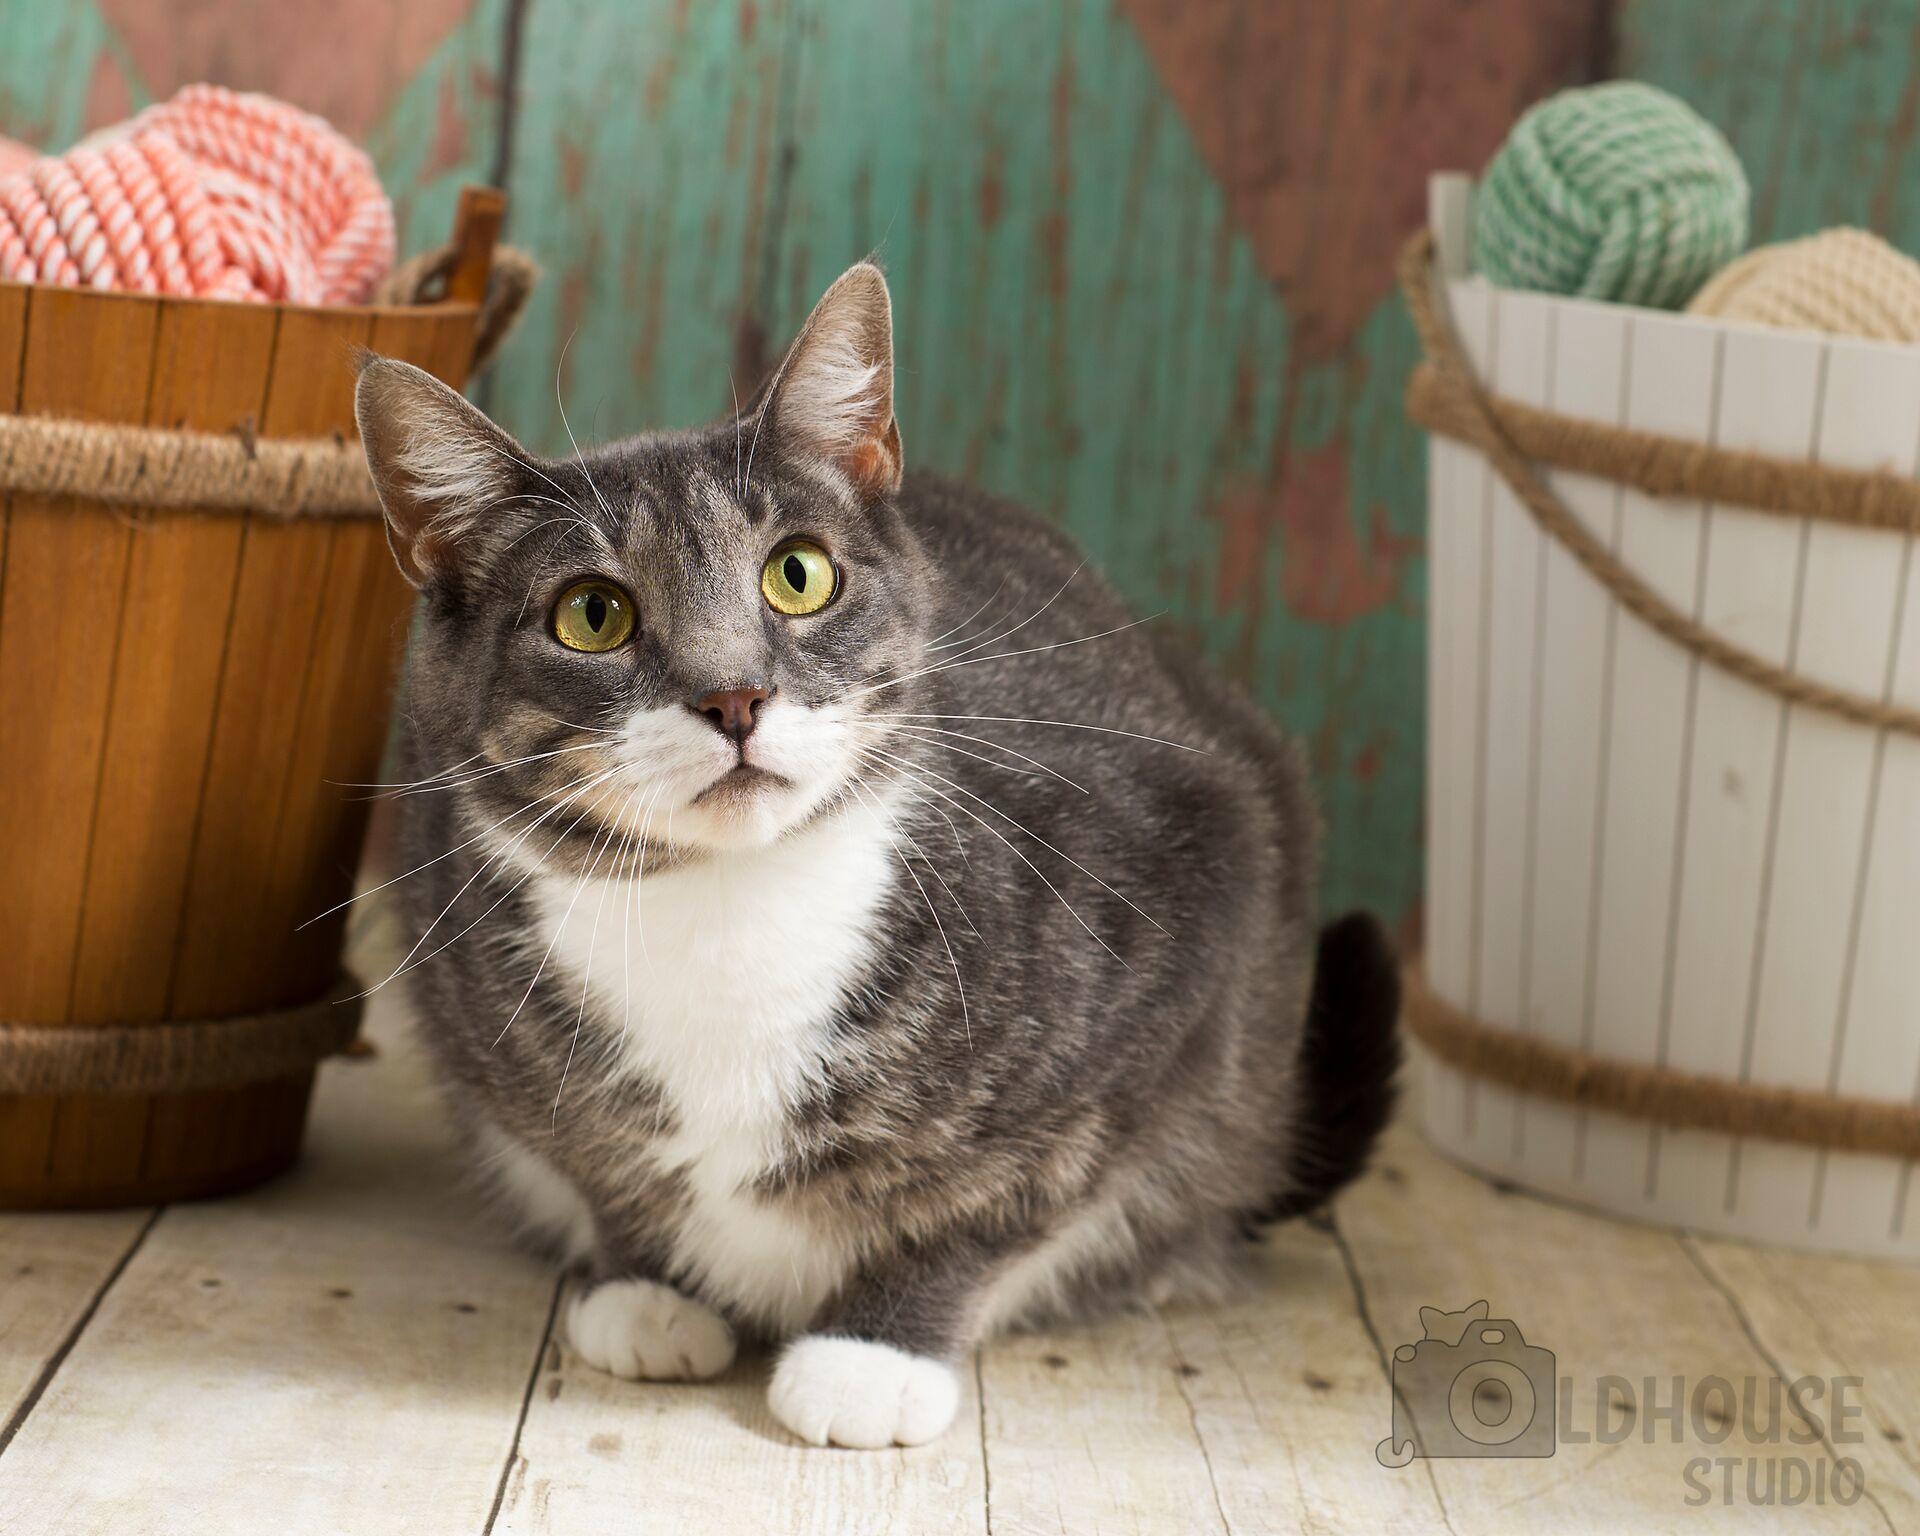 Iris - 2 yrs old - Colony Cat!